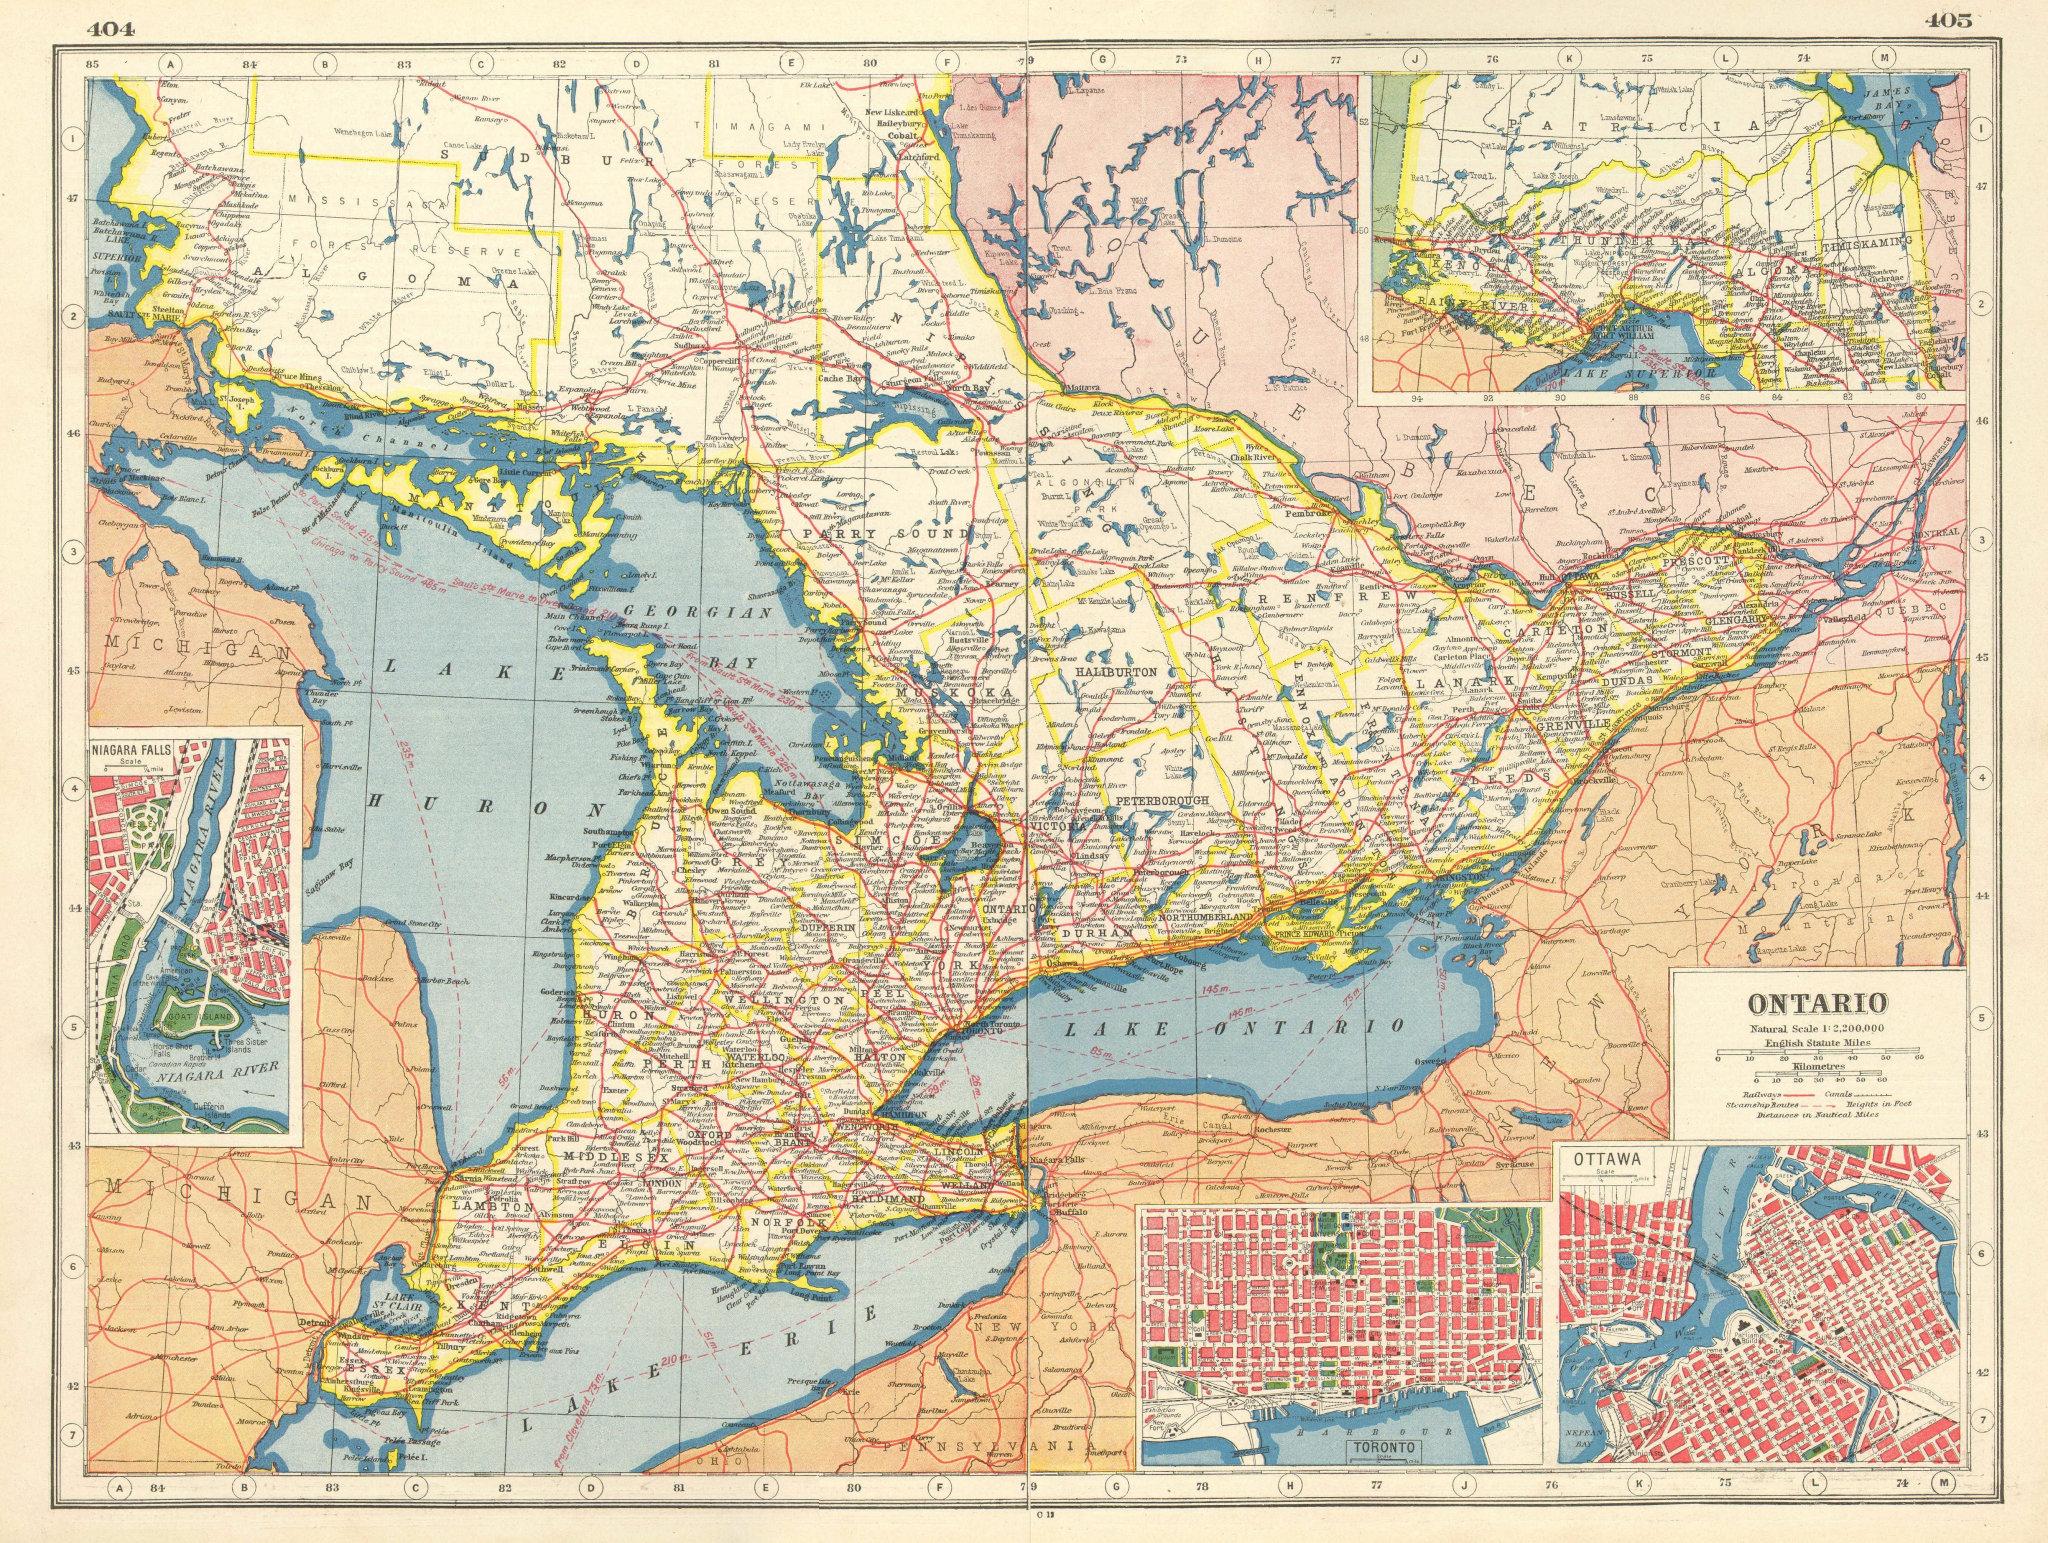 Associate Product ONTARIO. Niagara Falls Toronto Ottawa plans.Railroads.Steamship routes 1920 map